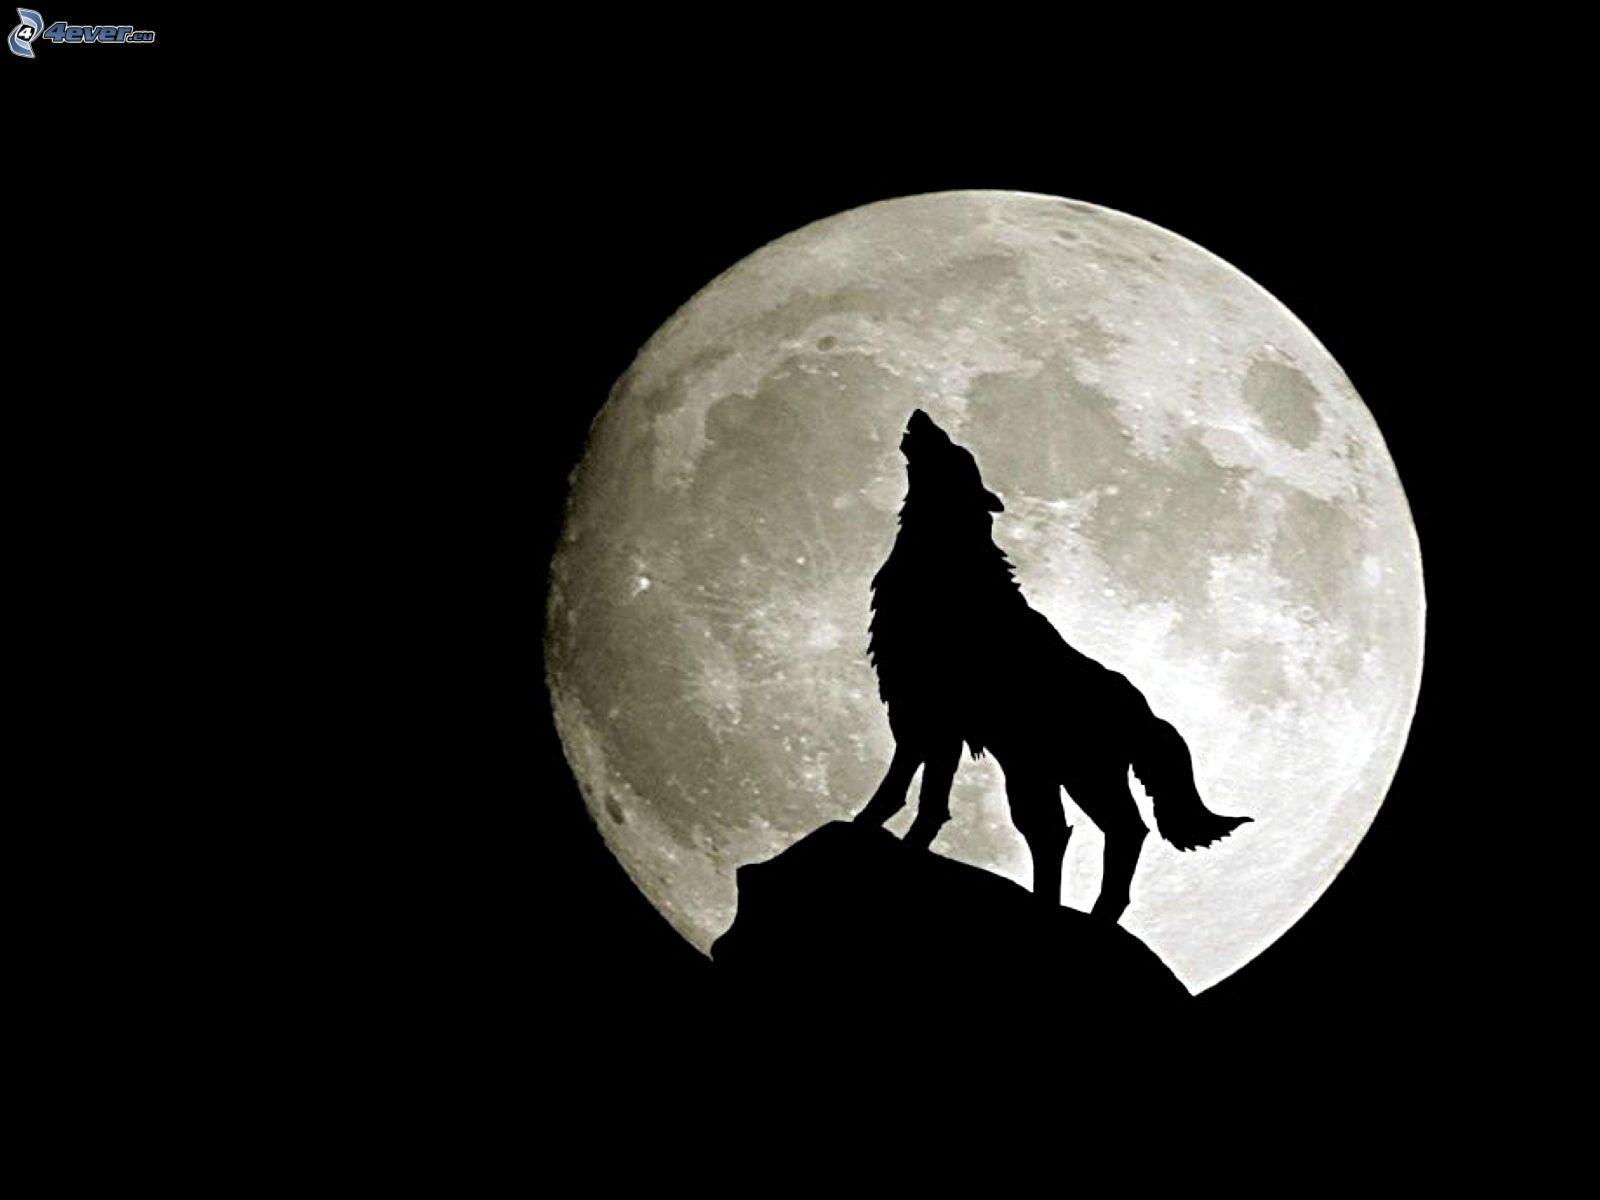 wolf howl, moon, silhouette, full moon 159922